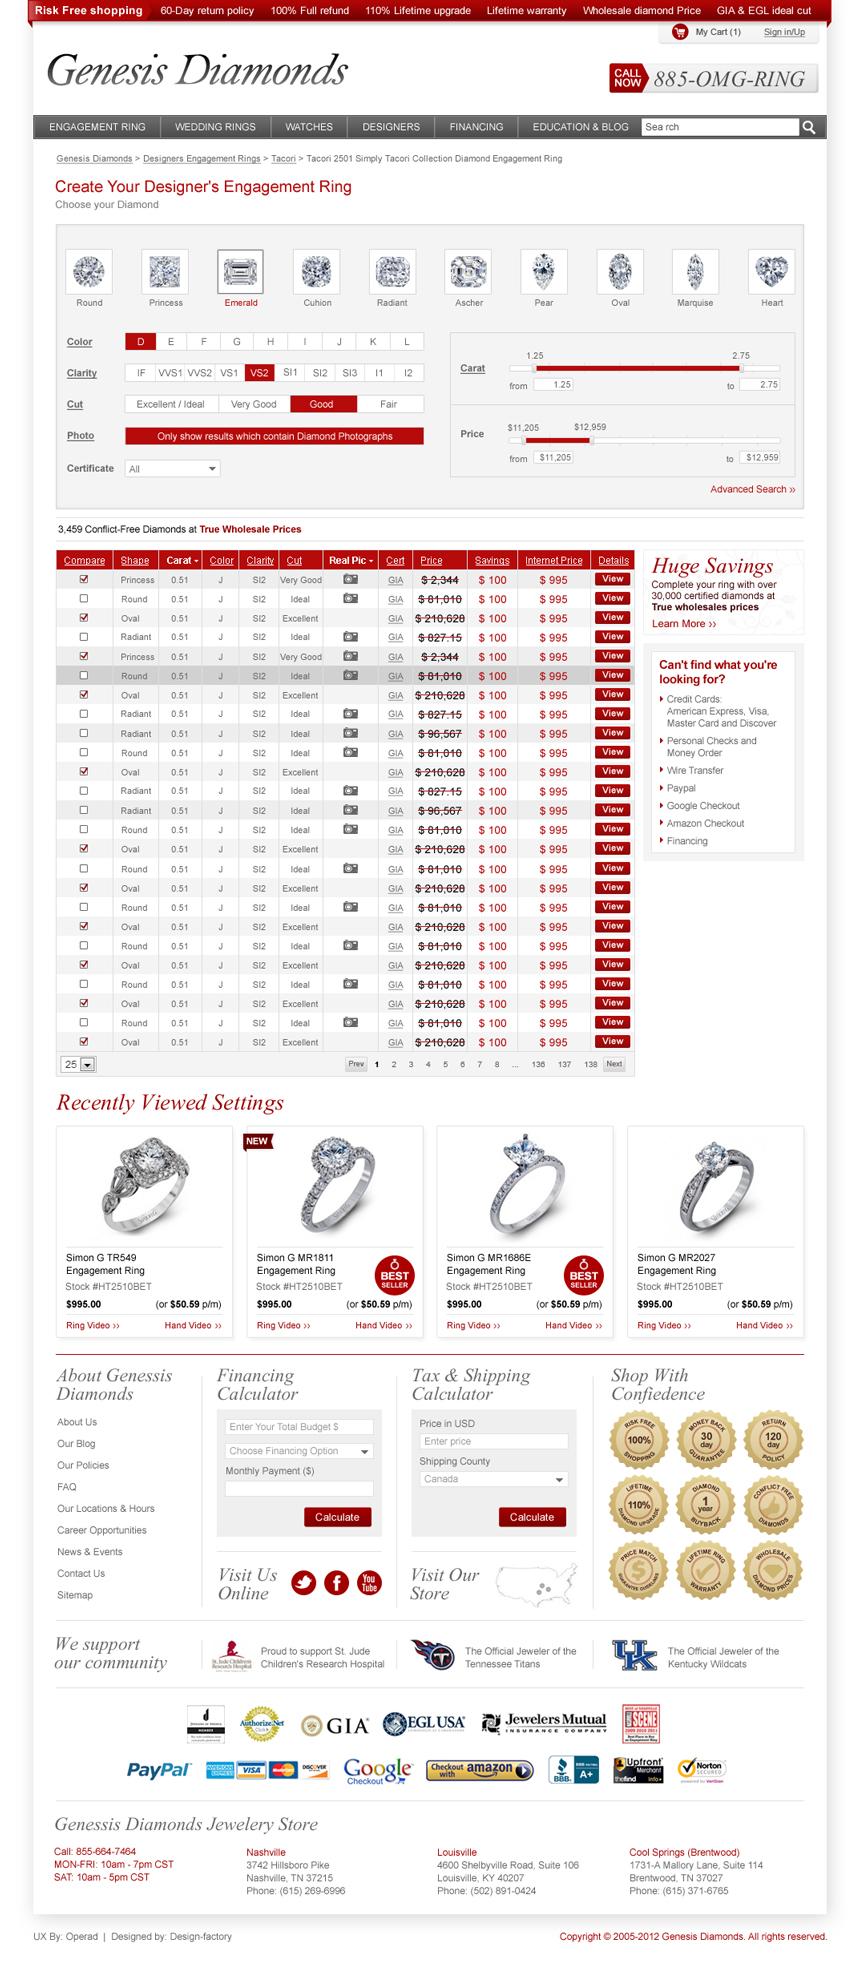 Genesis Diamonds website